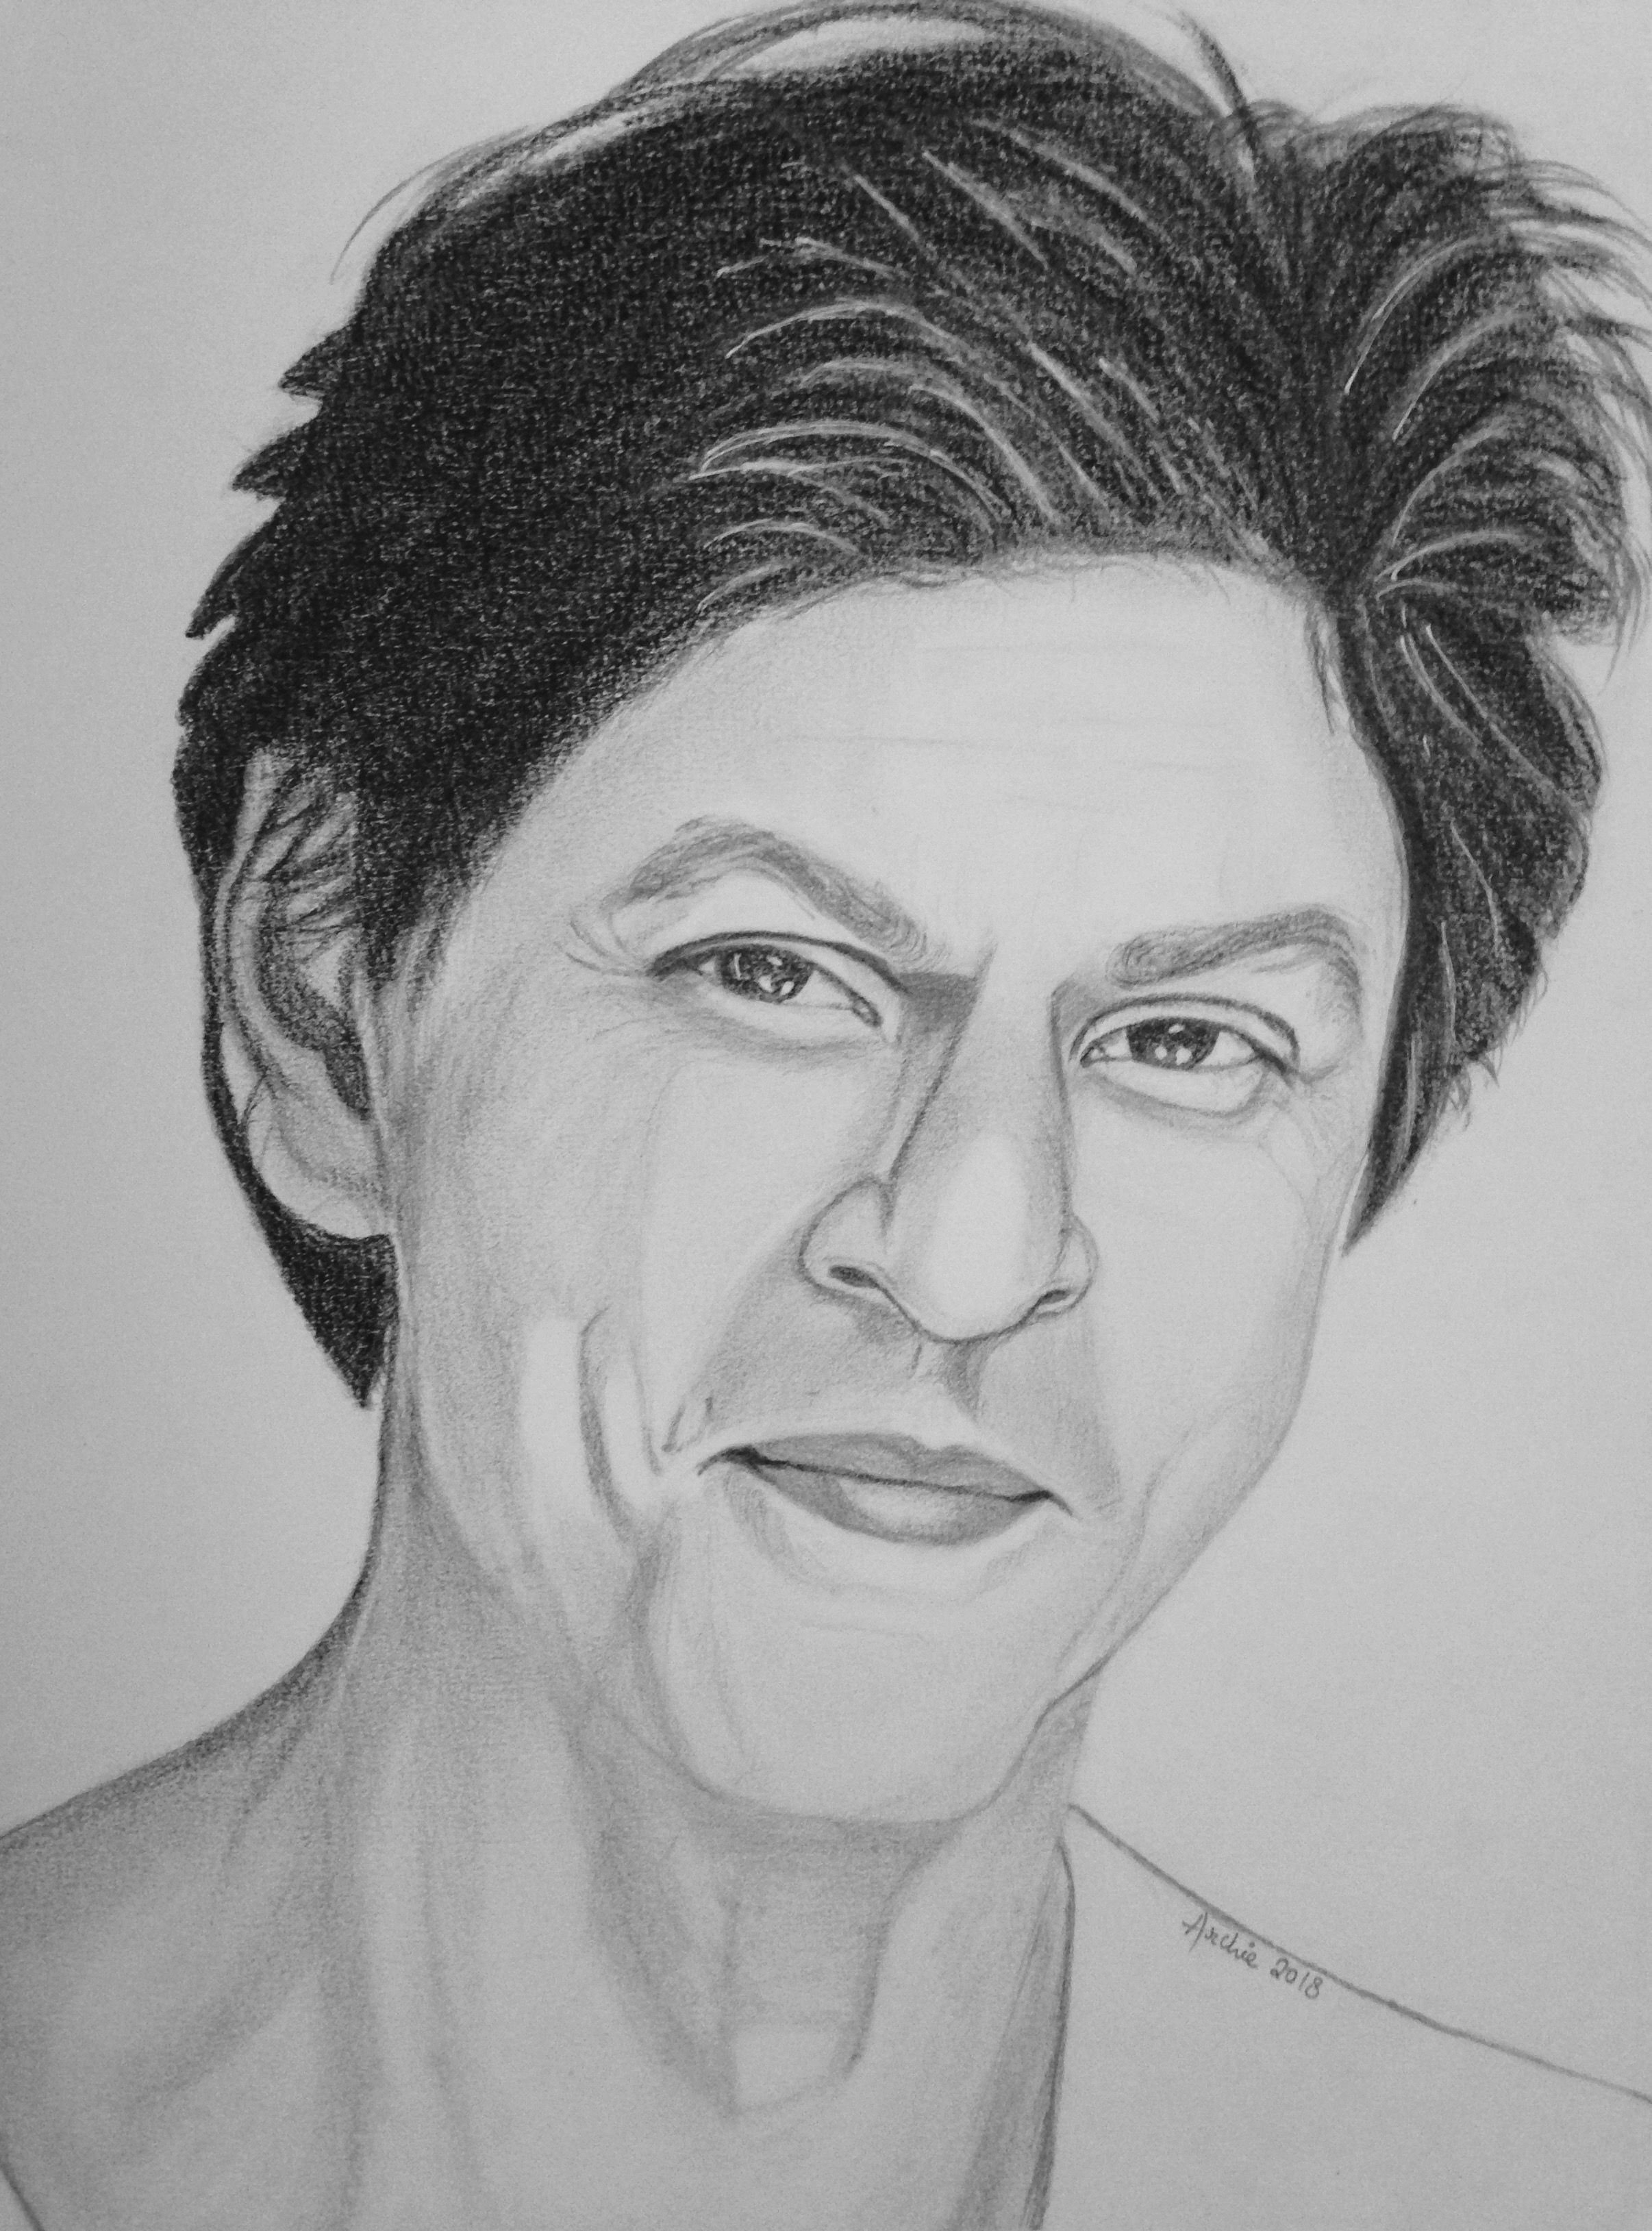 Shahrukh khan shahrukh khan art sketches portrait sketches art